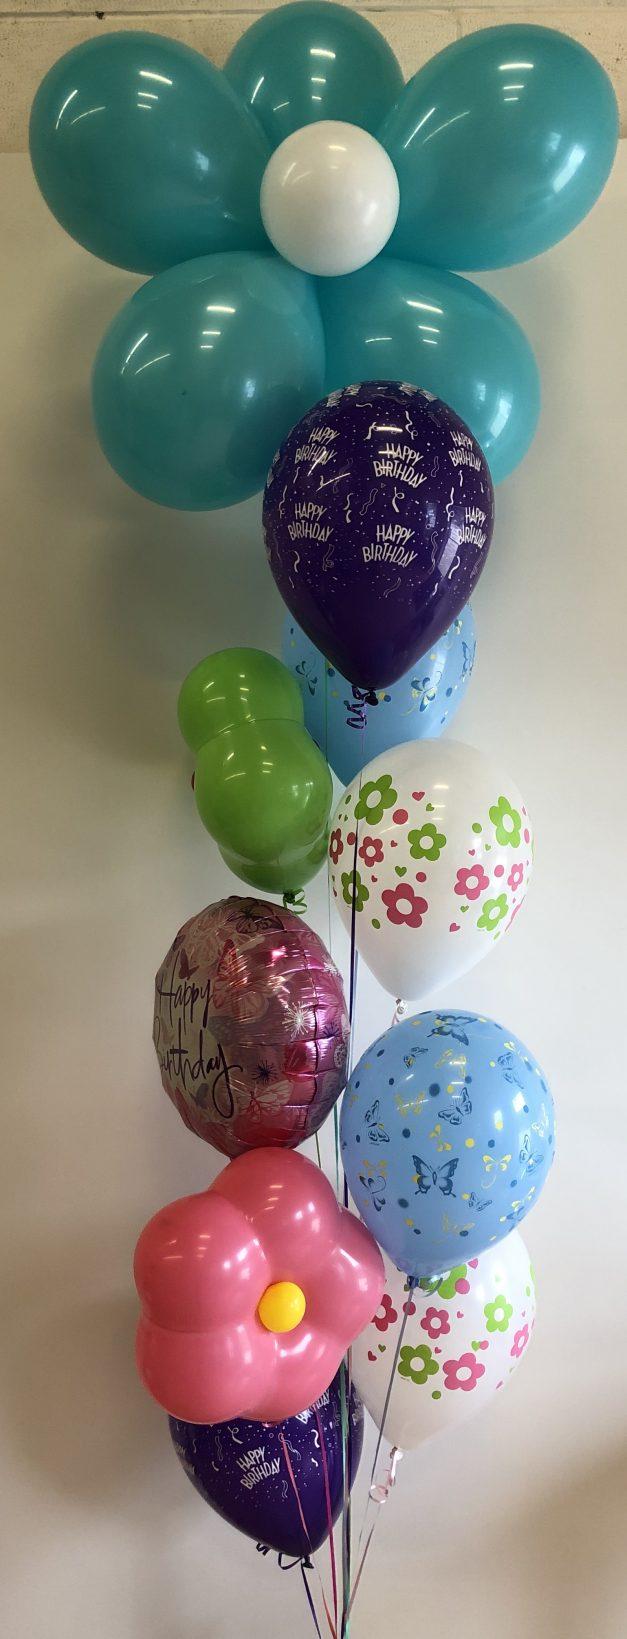 Flower balloons group of 10